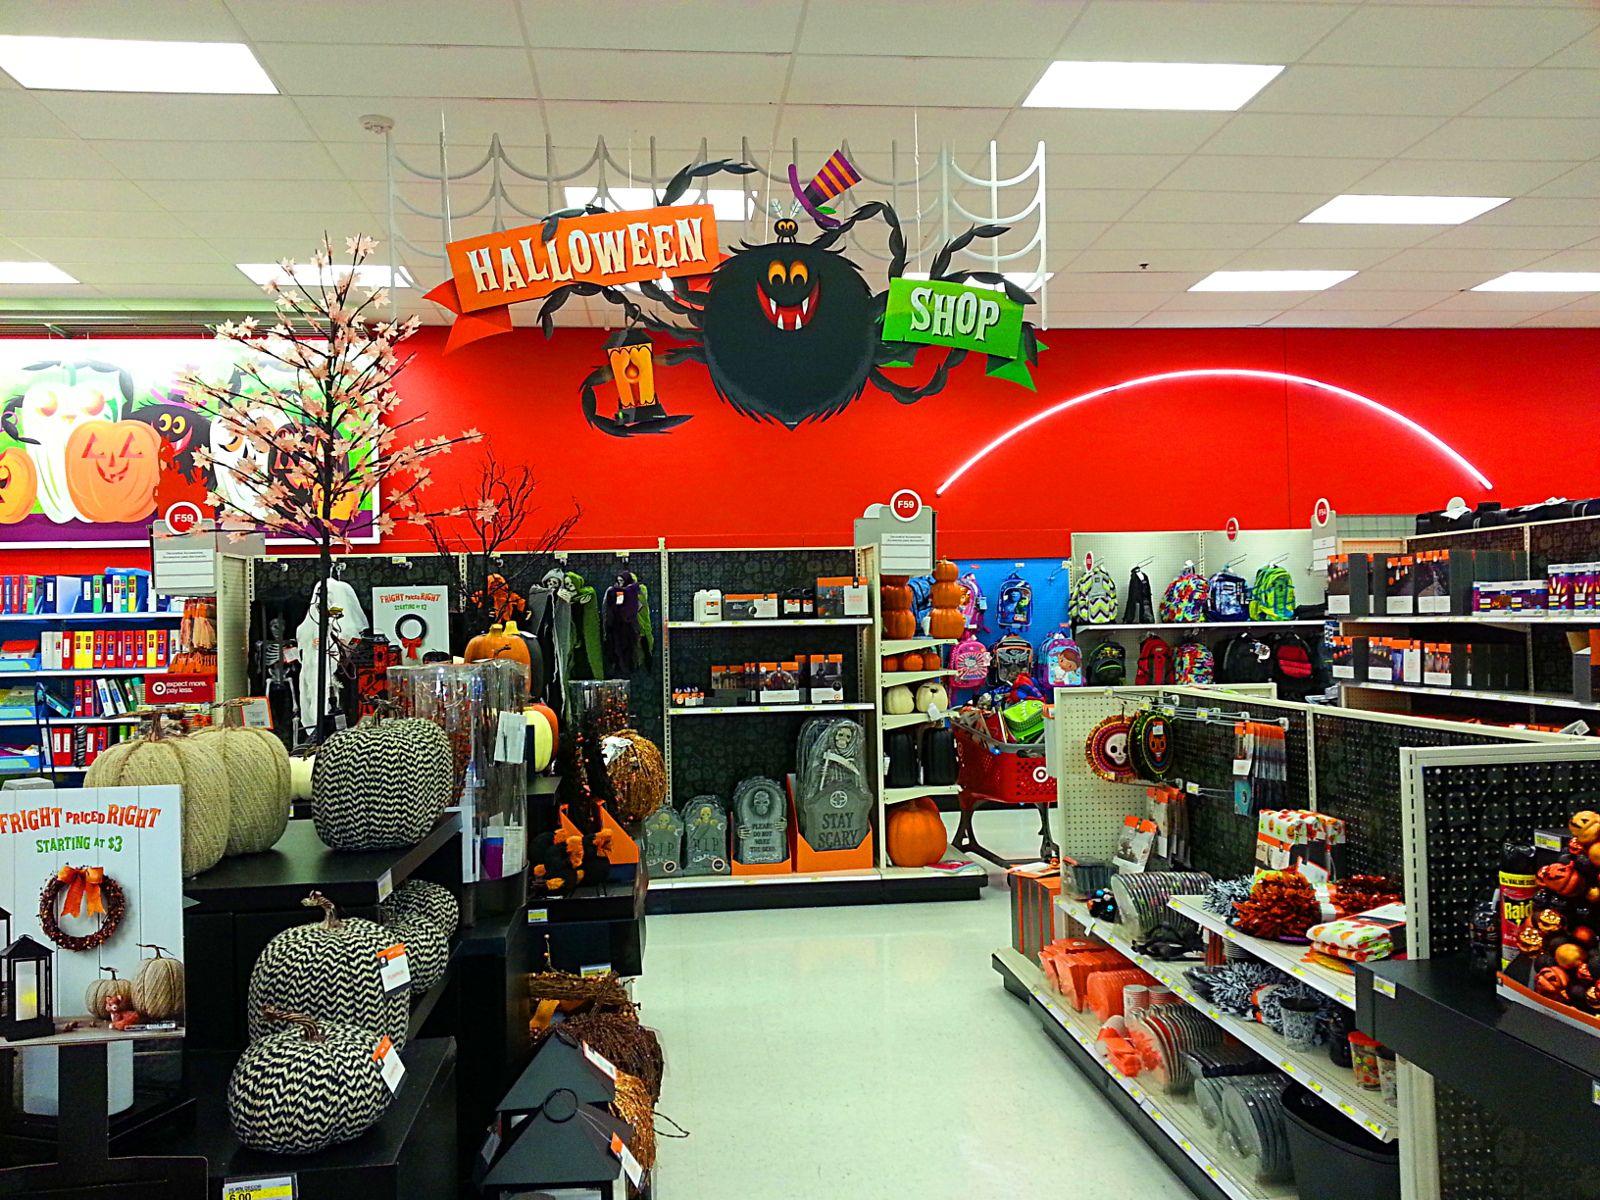 target halloween store graphics - google search | retro halloween